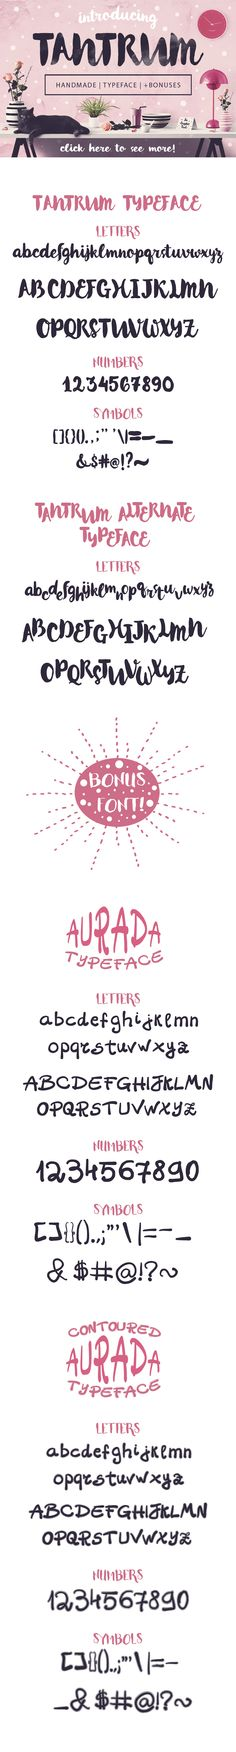 Tantrum Typeface + Bonus Artsy Kit! by Jas Graphic Tools on Creative Market